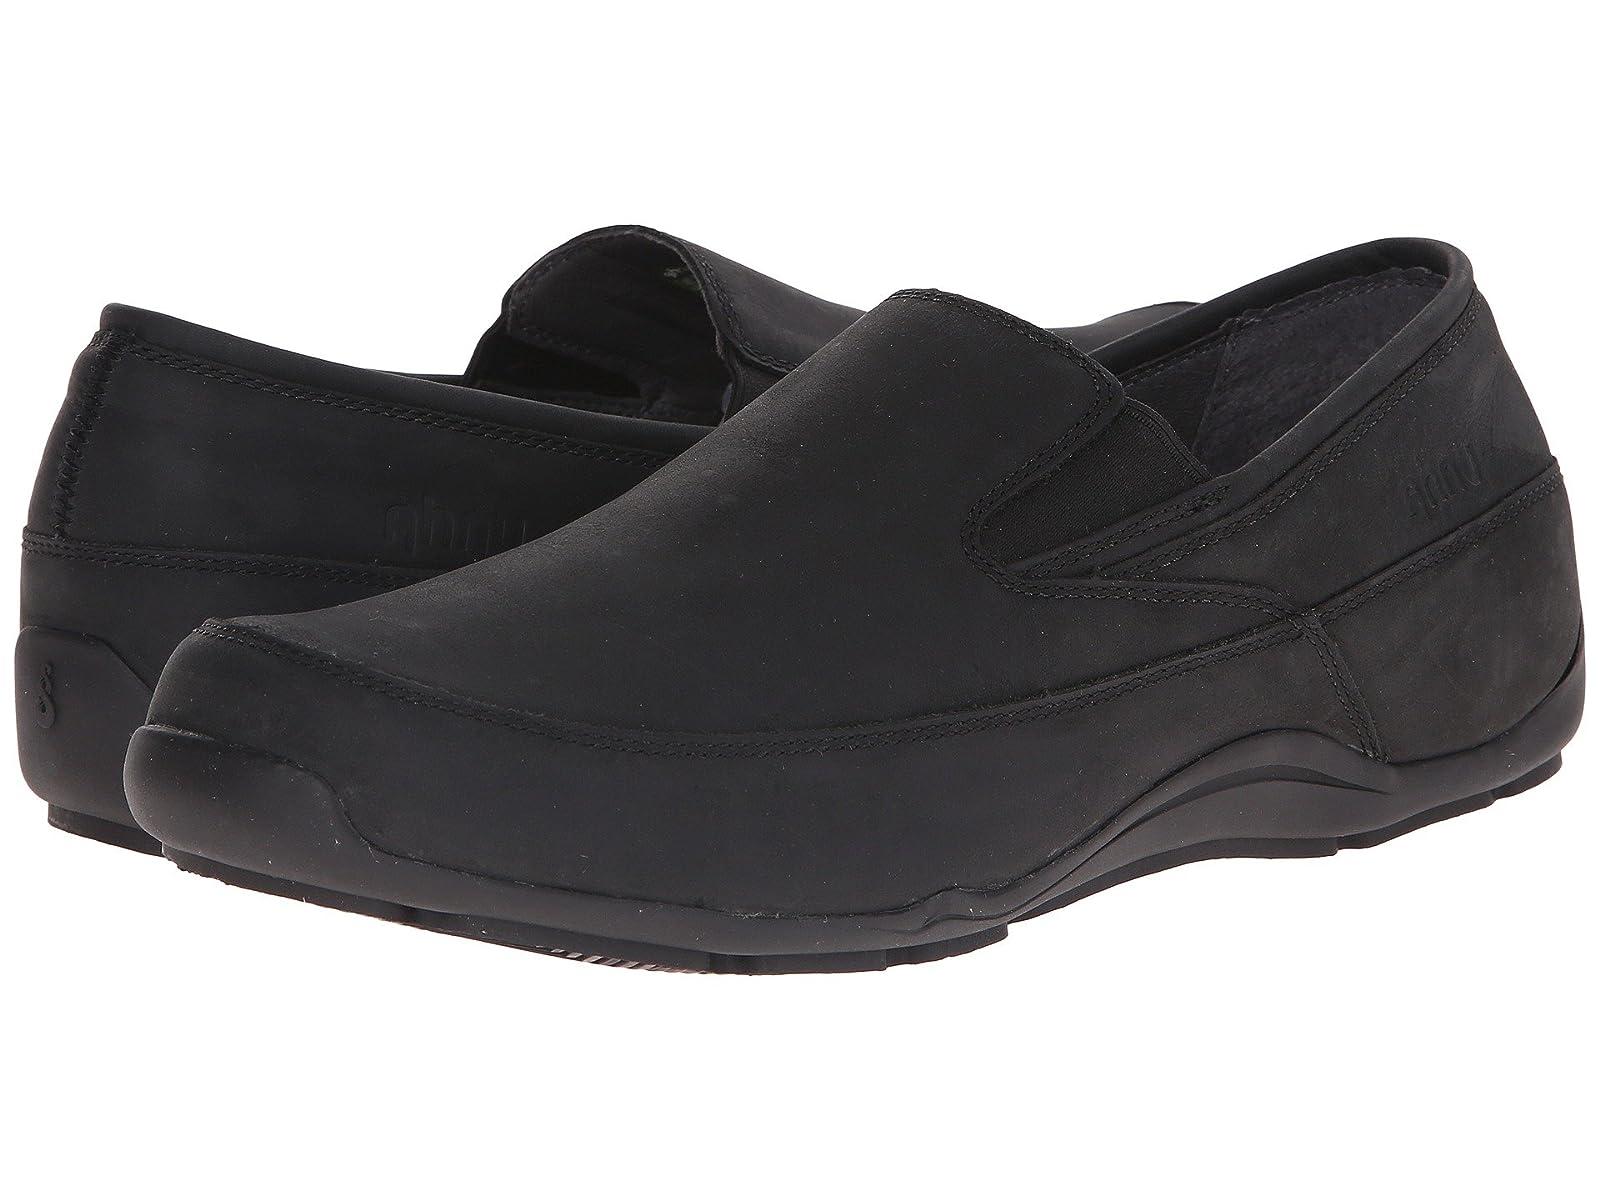 Ahnu Jack ProCheap and distinctive eye-catching shoes